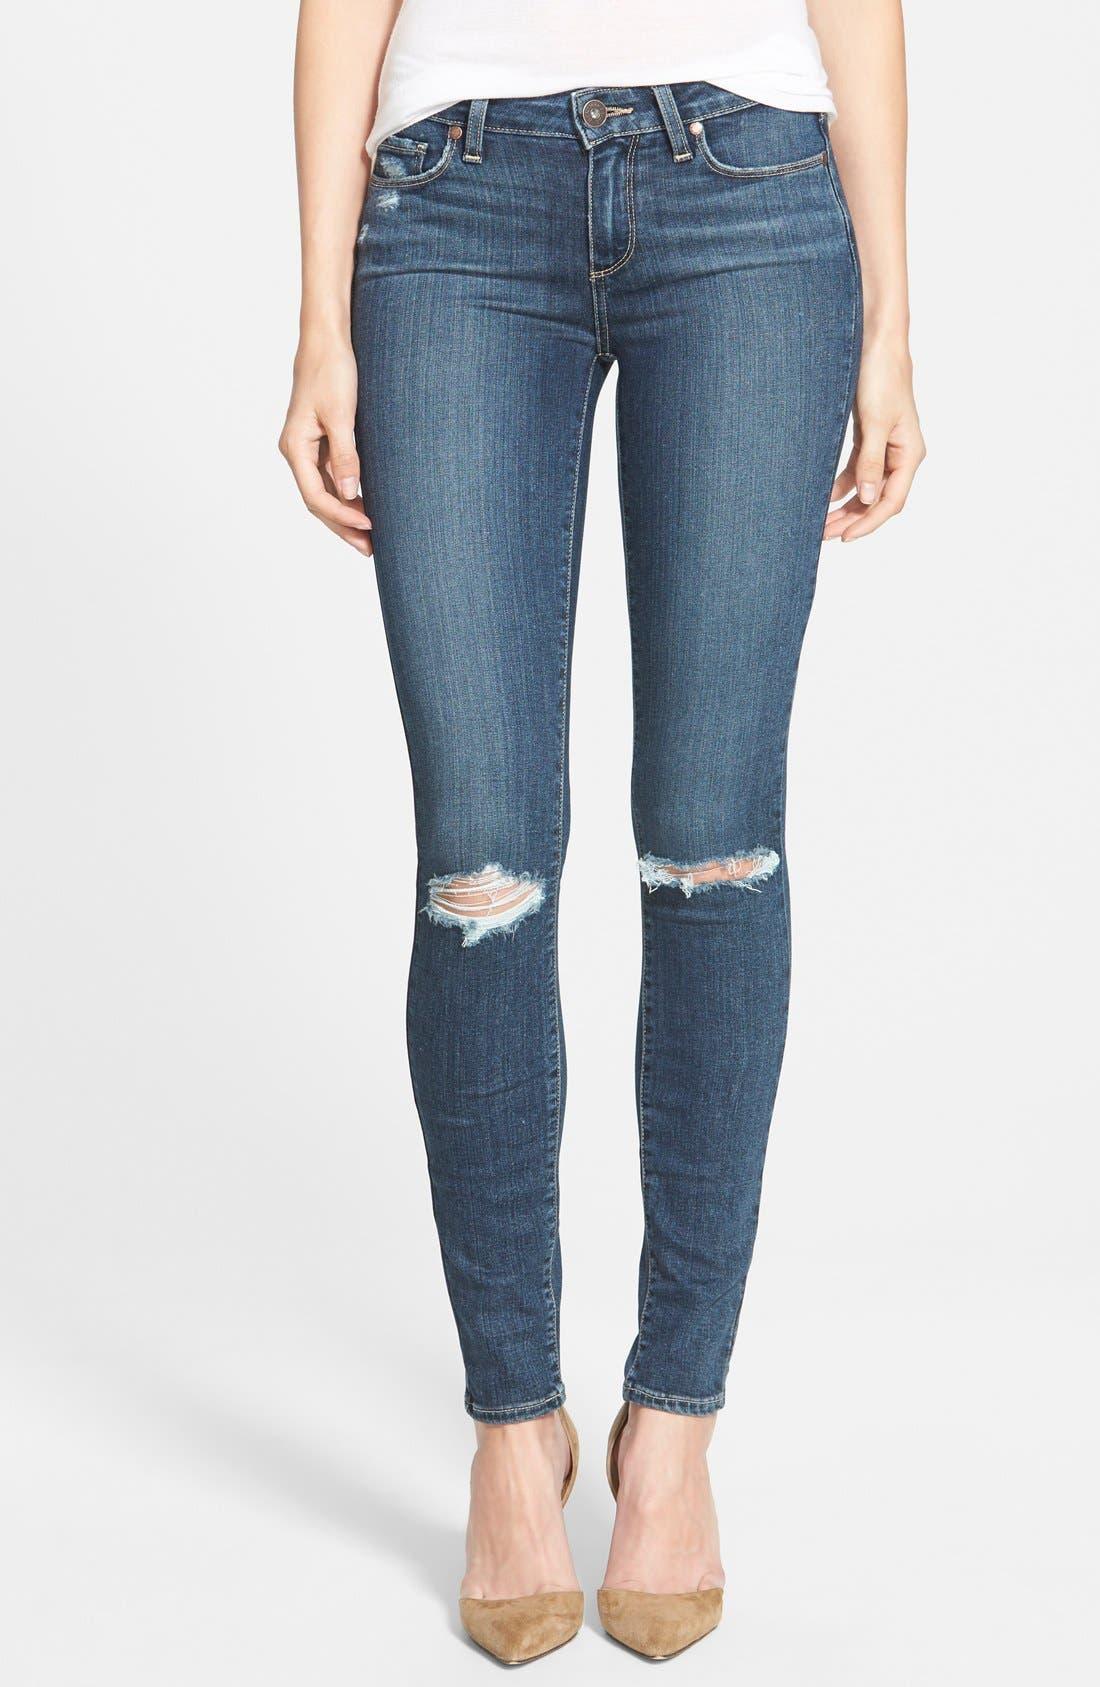 Main Image - Paige Denim 'Transcend - Verdugo' Ultra Skinny Jeans (Quinnley Destructed)